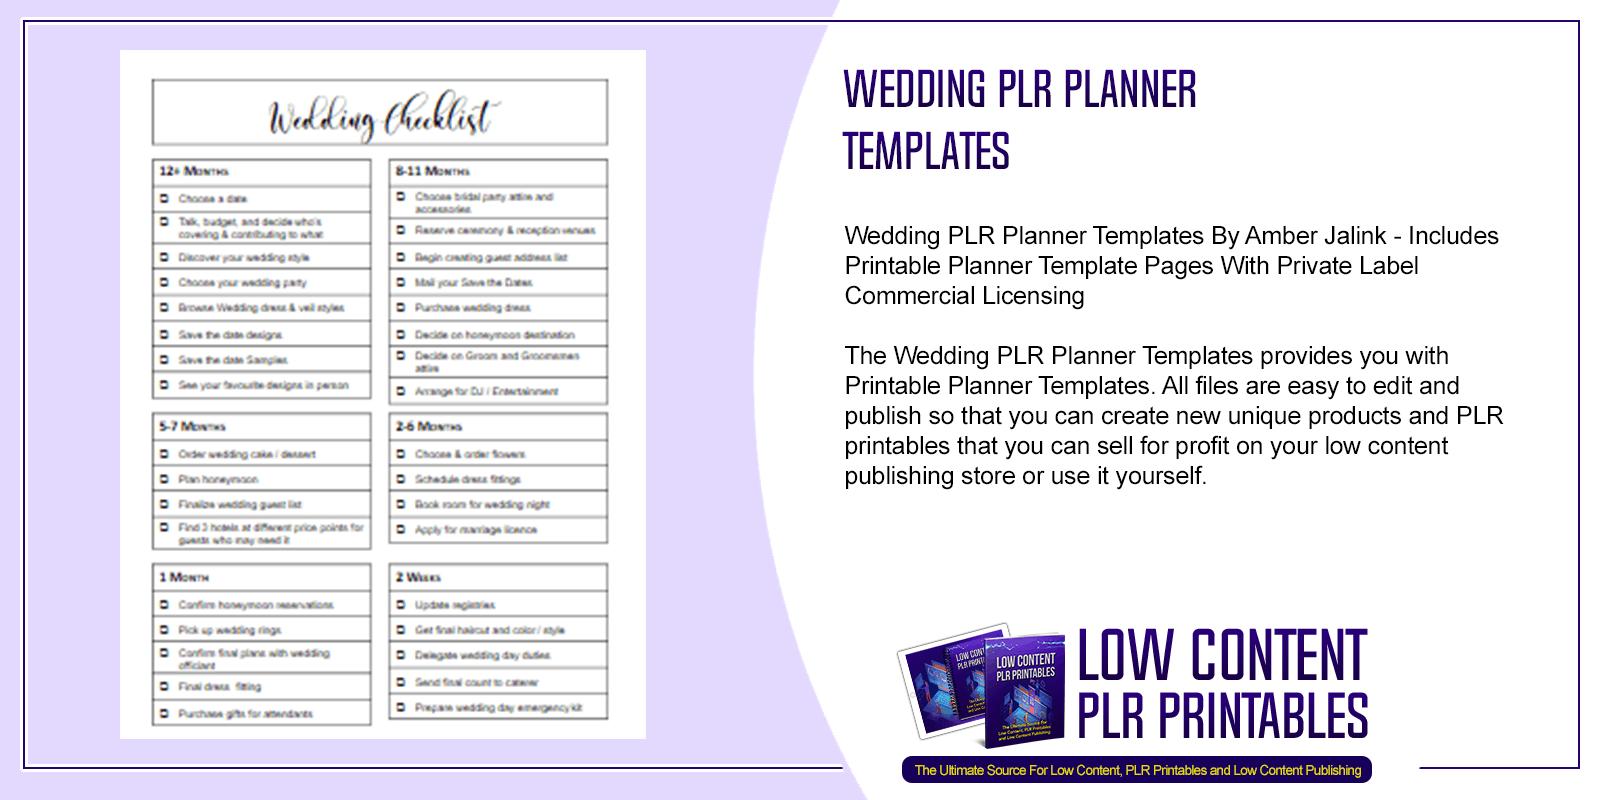 Wedding PLR Planner Templates